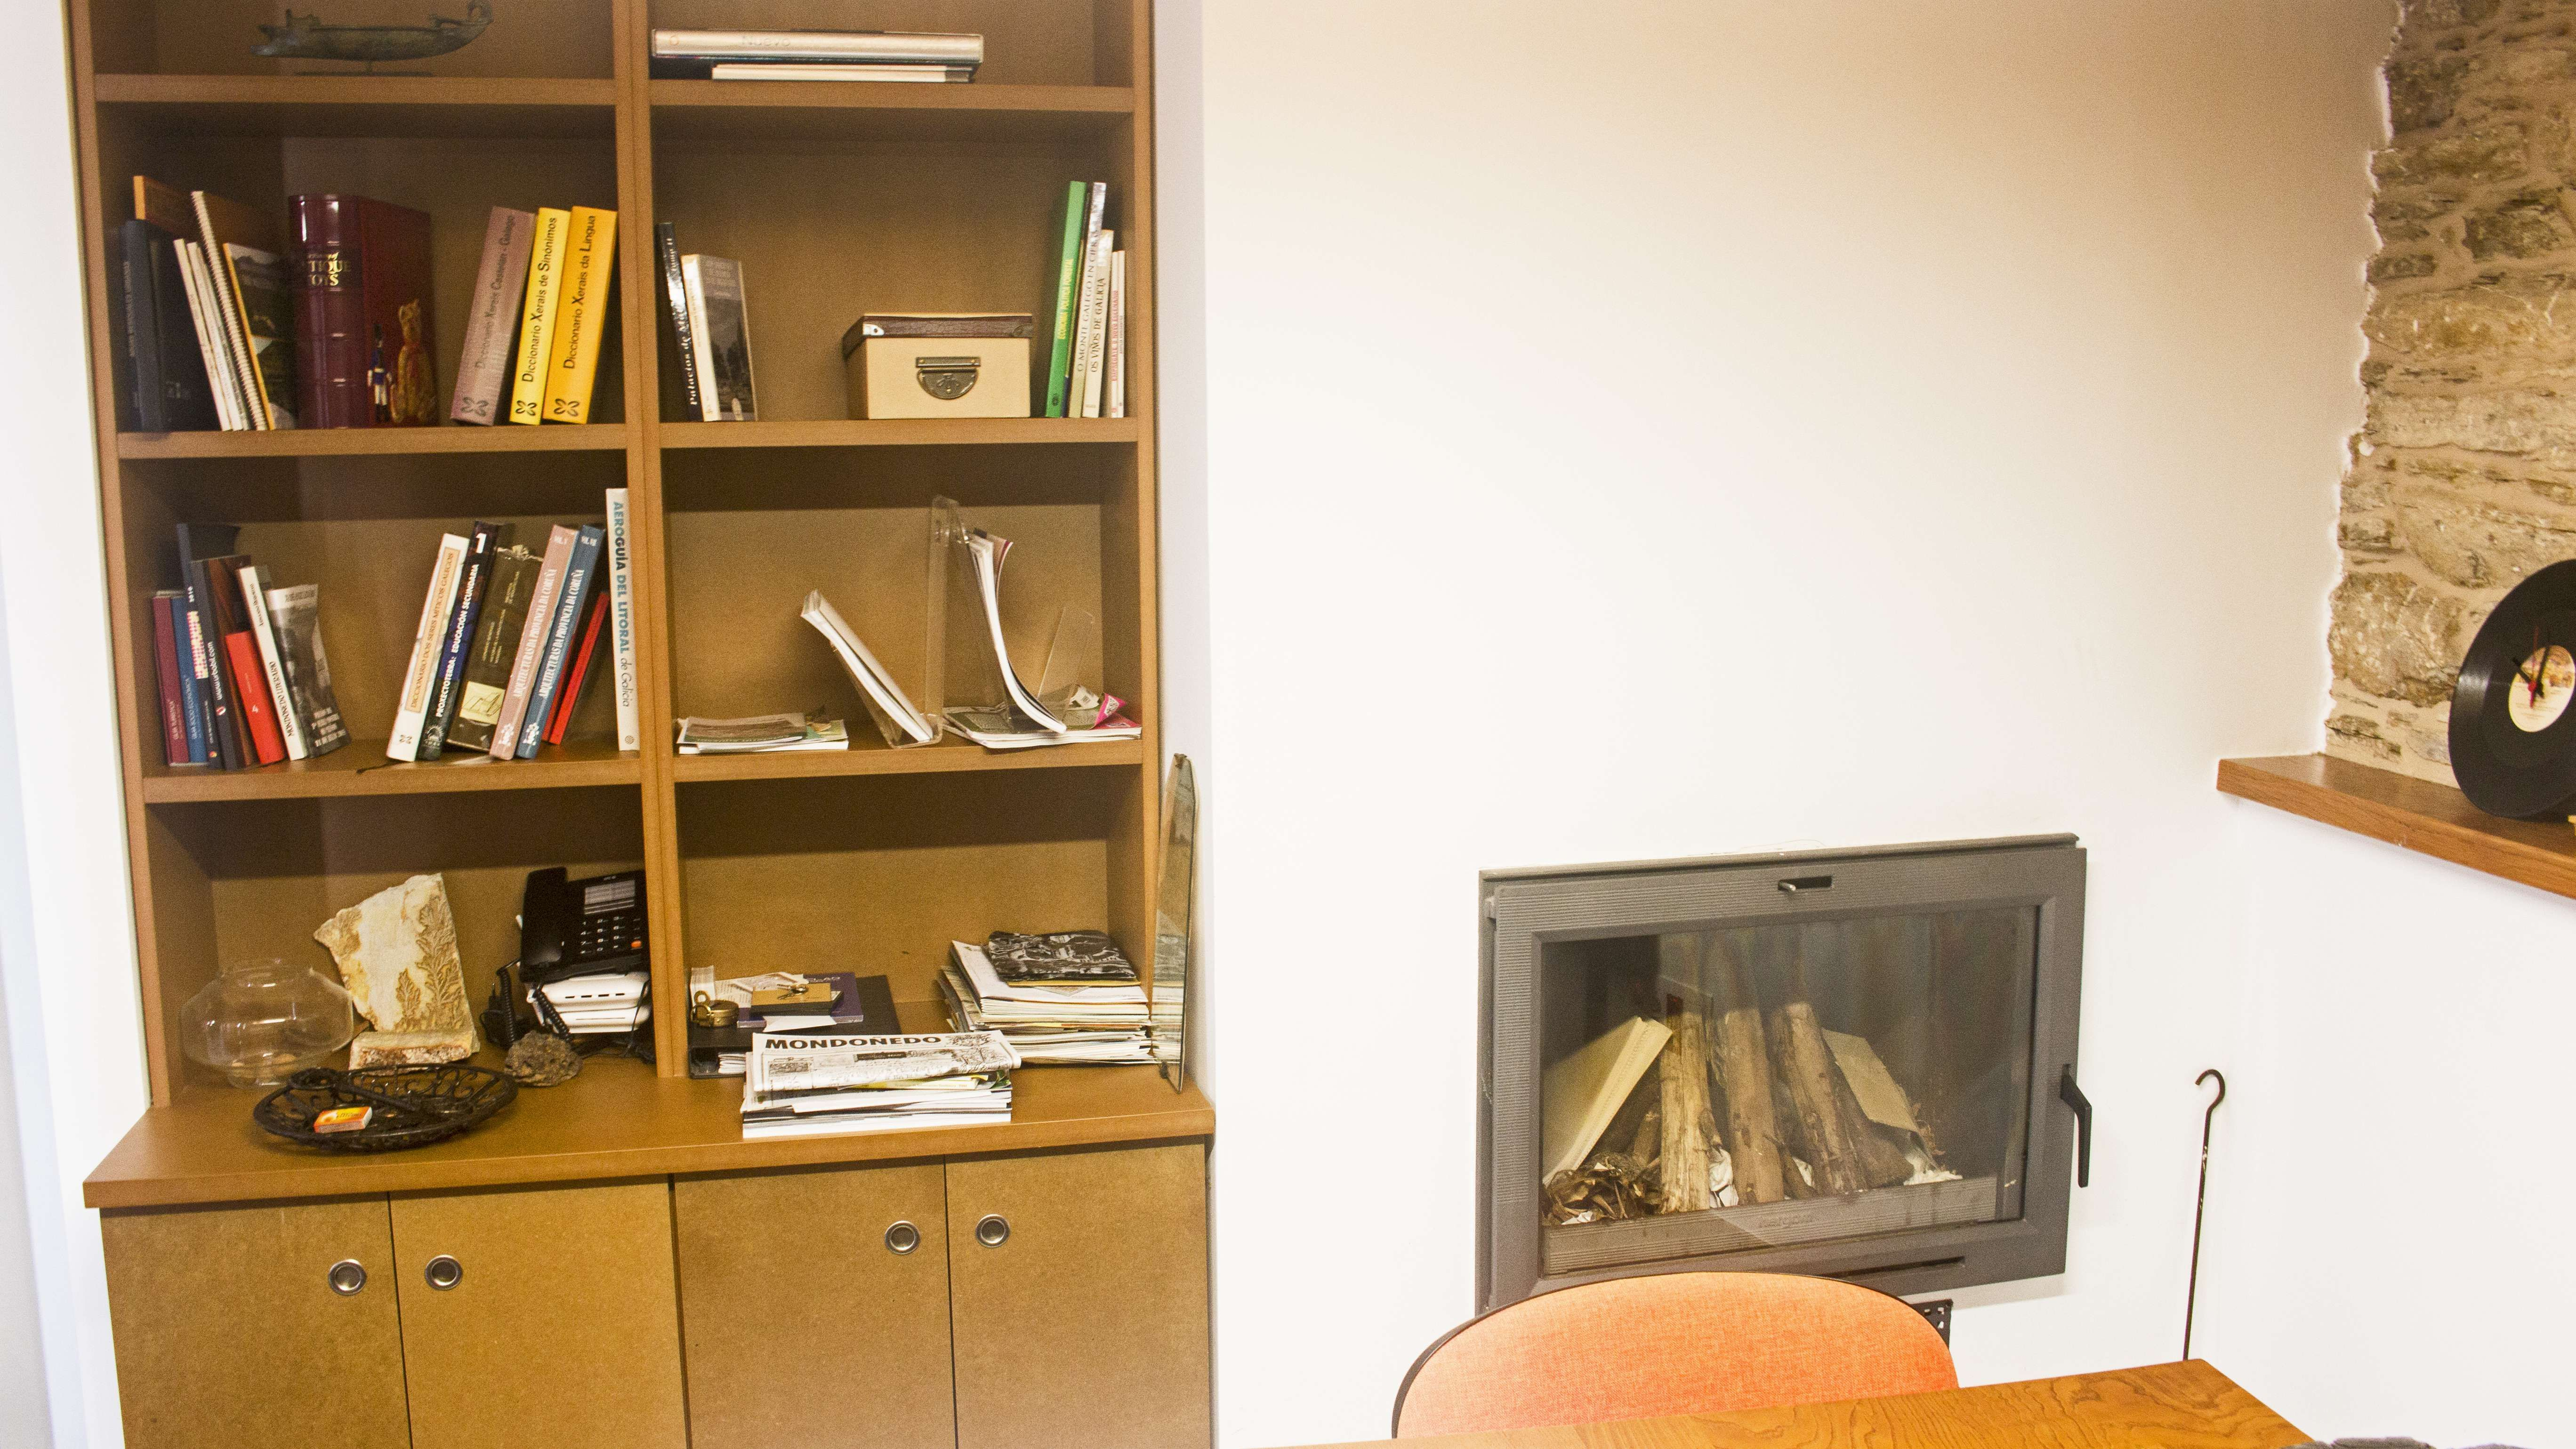 Realización de proyectos de uso residencial